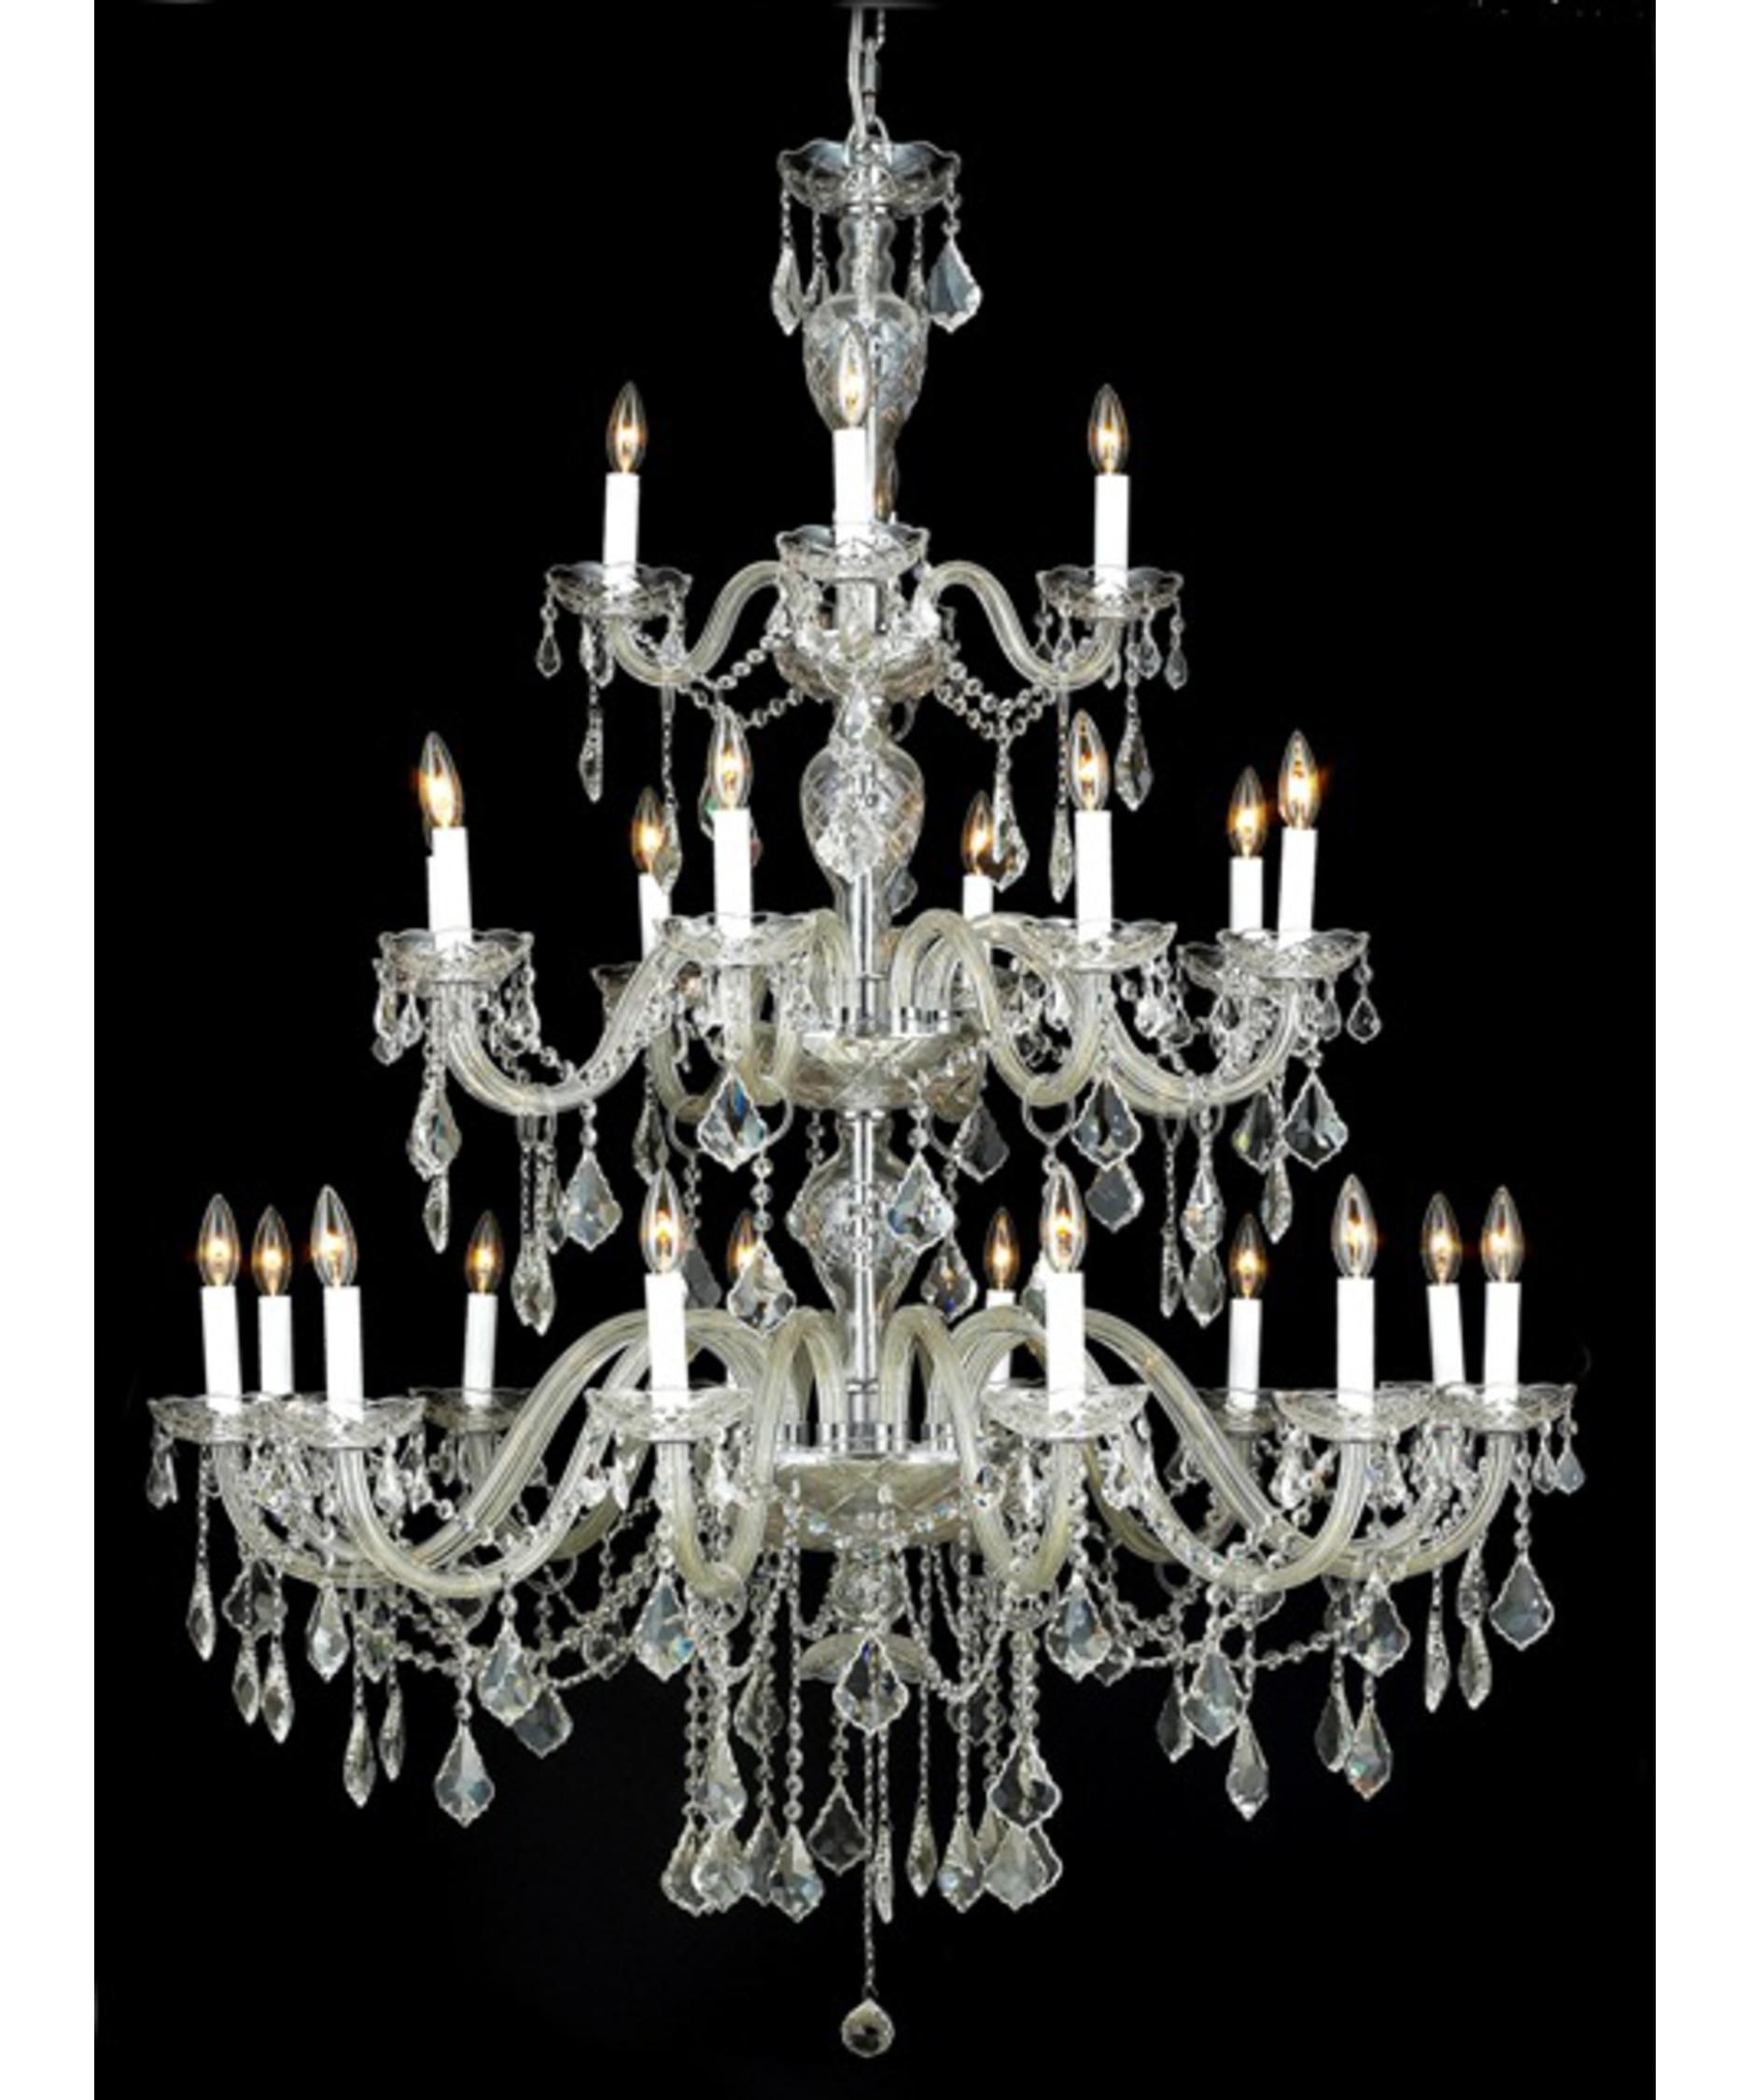 Elegant lighting alexandria 45 inch wide 24 light chandelier elegant lighting alexandria 45 inch wide 24 light chandelier capitol lighting 1 800lighting arubaitofo Image collections